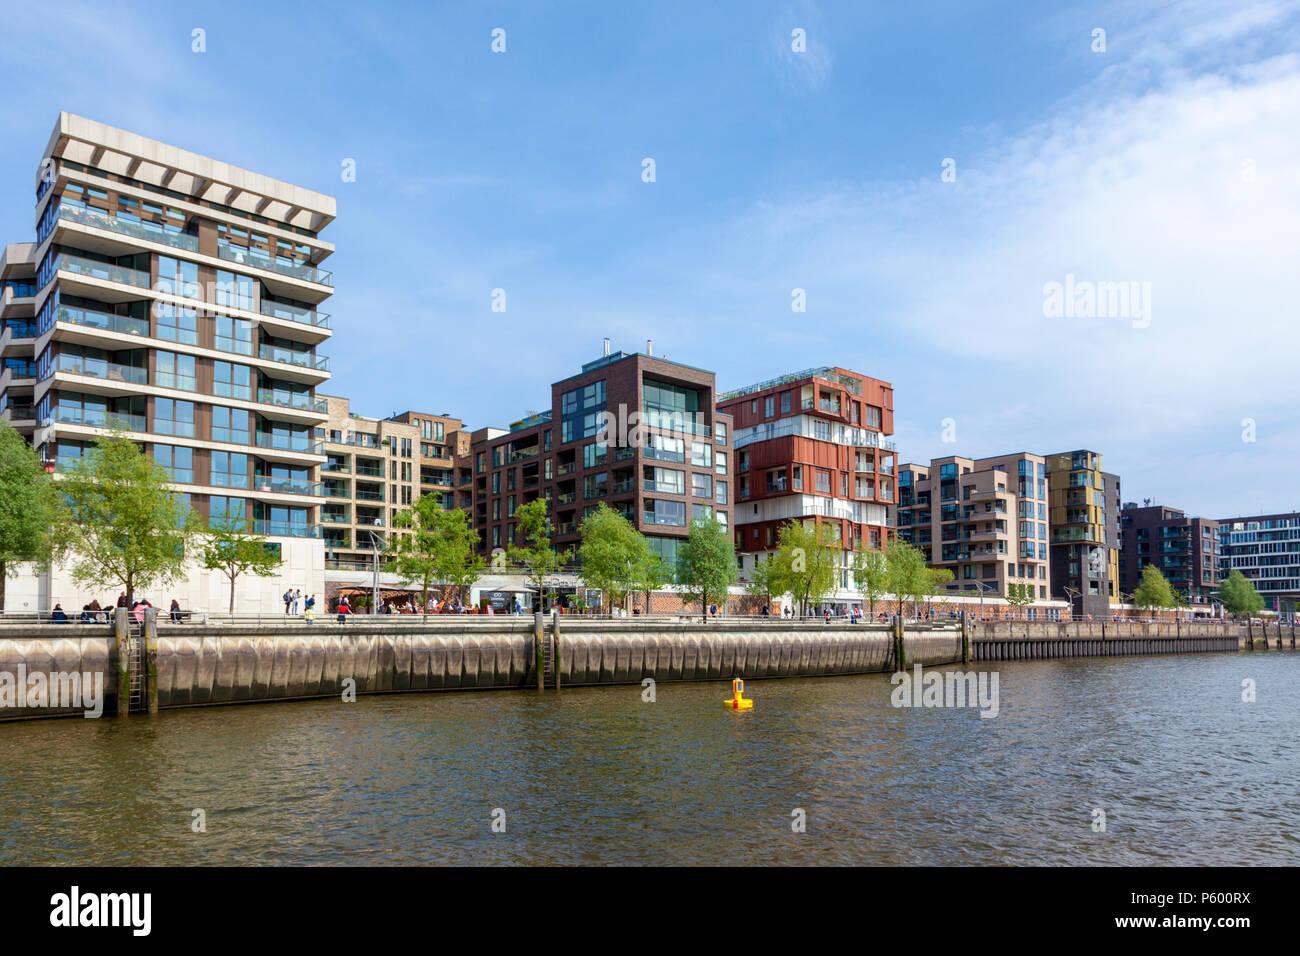 Contemporary residential architecture at HafenCity quarter, Hamburg - Stock Image